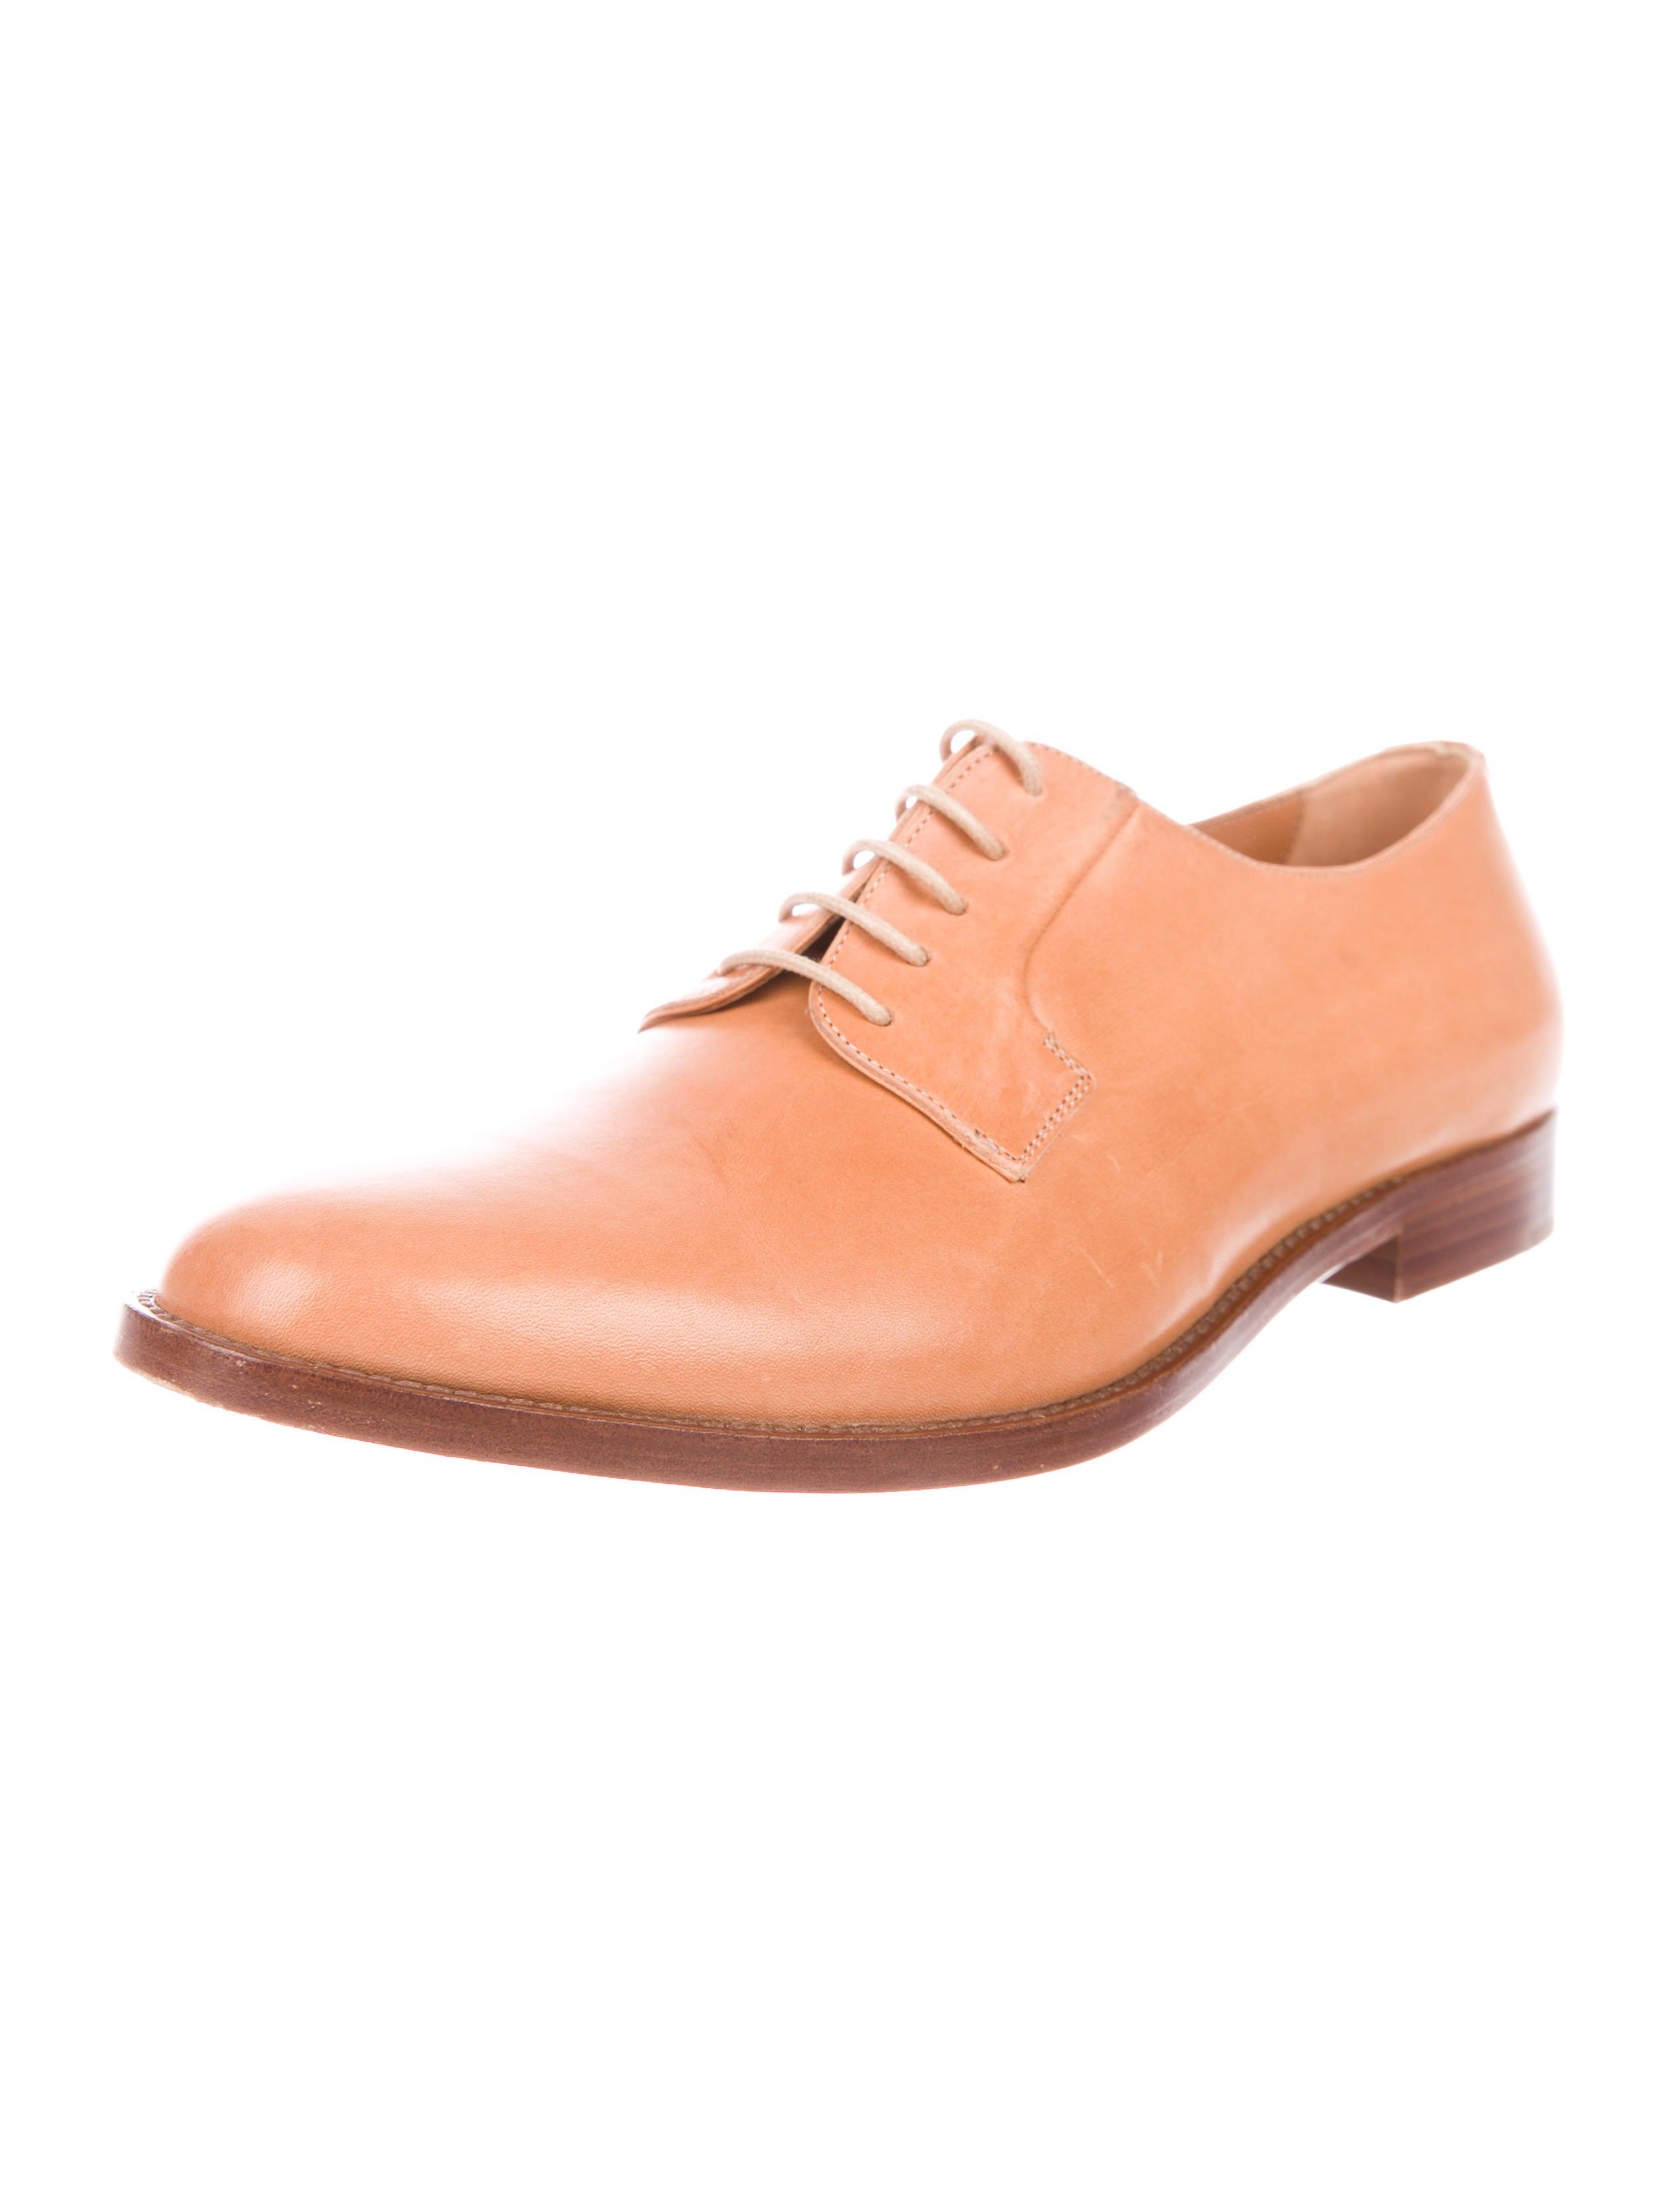 Mansur Gavriel Leather Round-Toe Oxfords for sale buy authentic online x4GZ9uKG